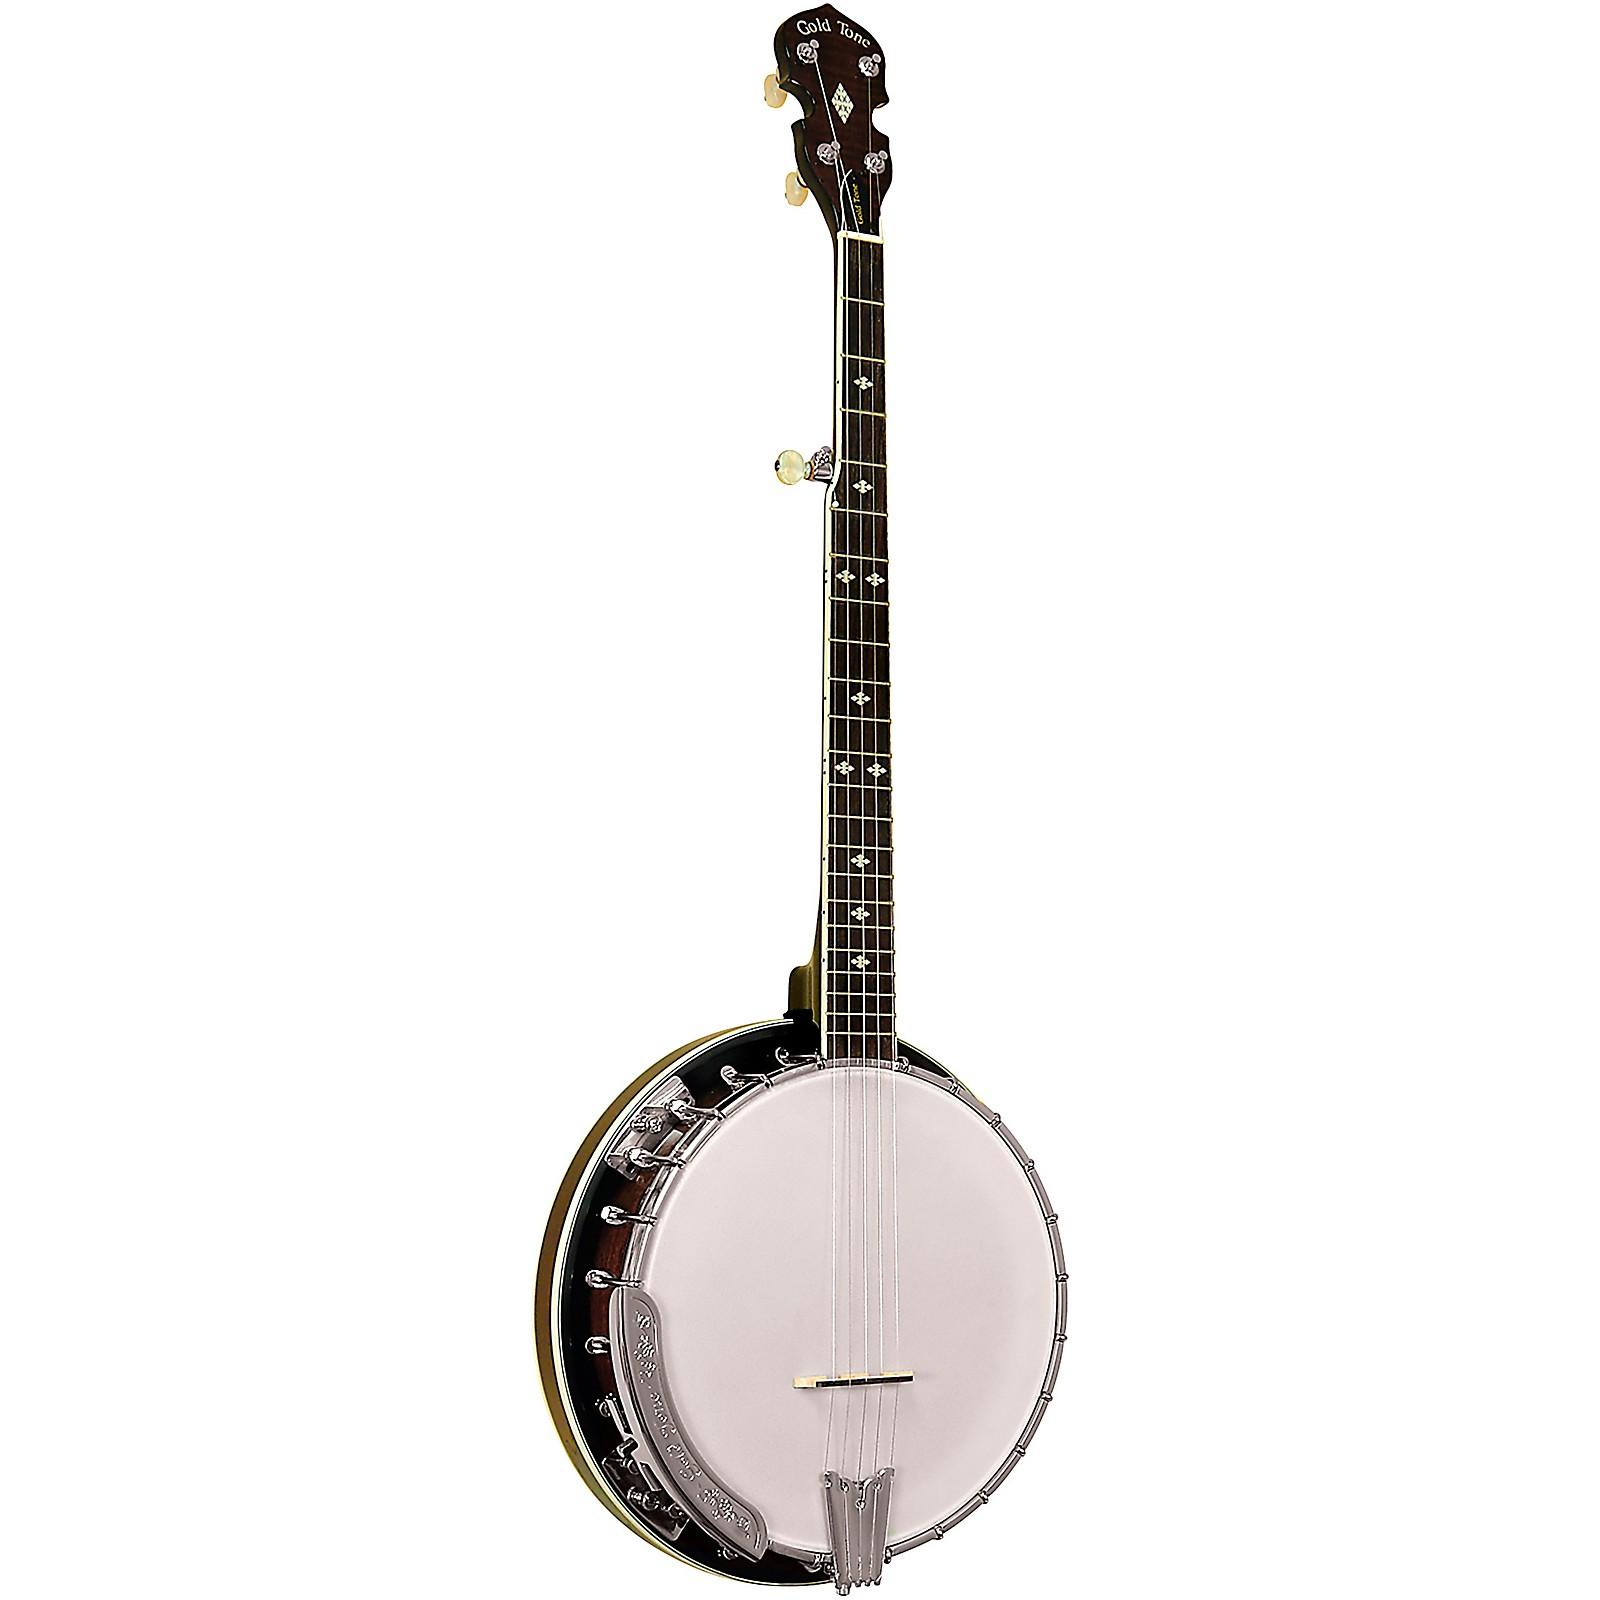 Gold Tone BG-250 Left-Handed Bluegrass Banjo